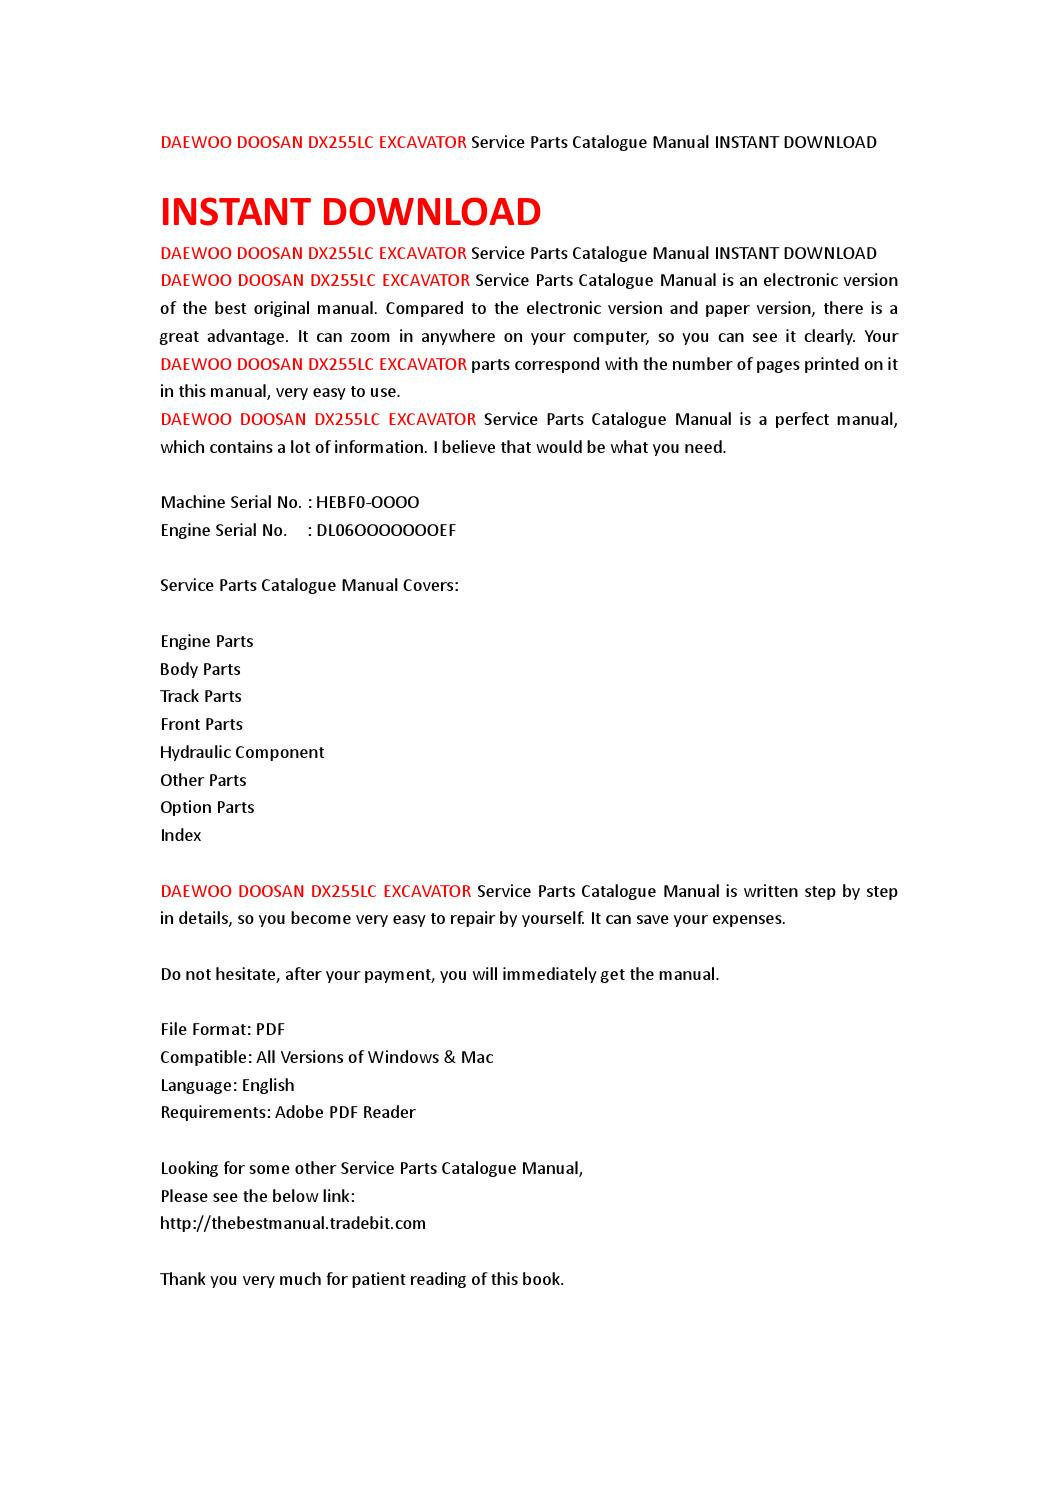 Daewoo doosan dx255lc excavator service parts catalogue manual instant  download by jhsefjn7 - issuu